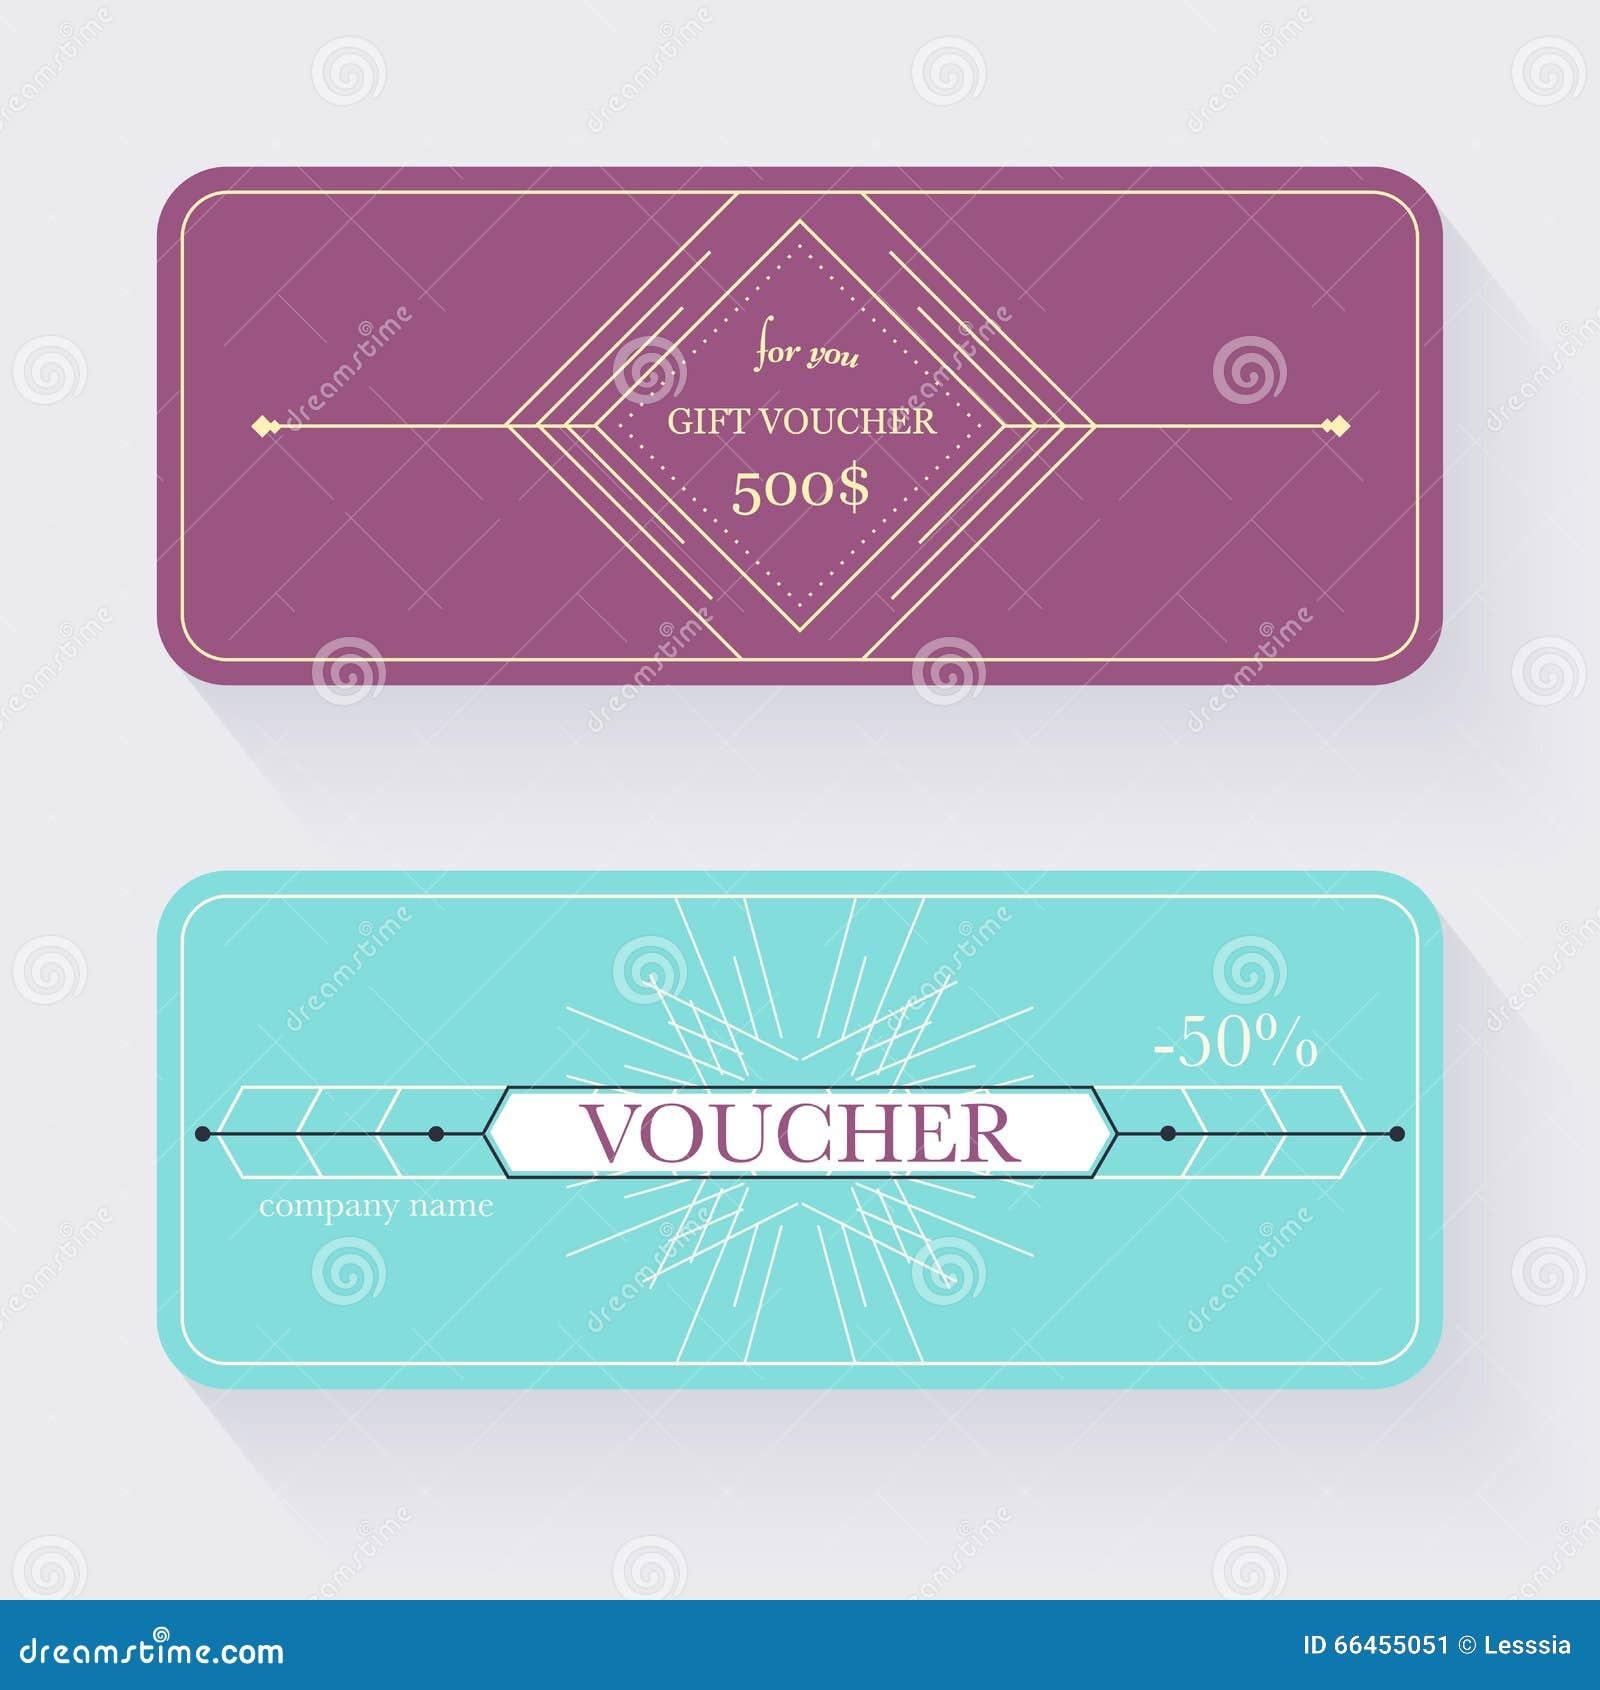 gift voucher template gift certificate background design gift gift voucher template gift certificate background design gift